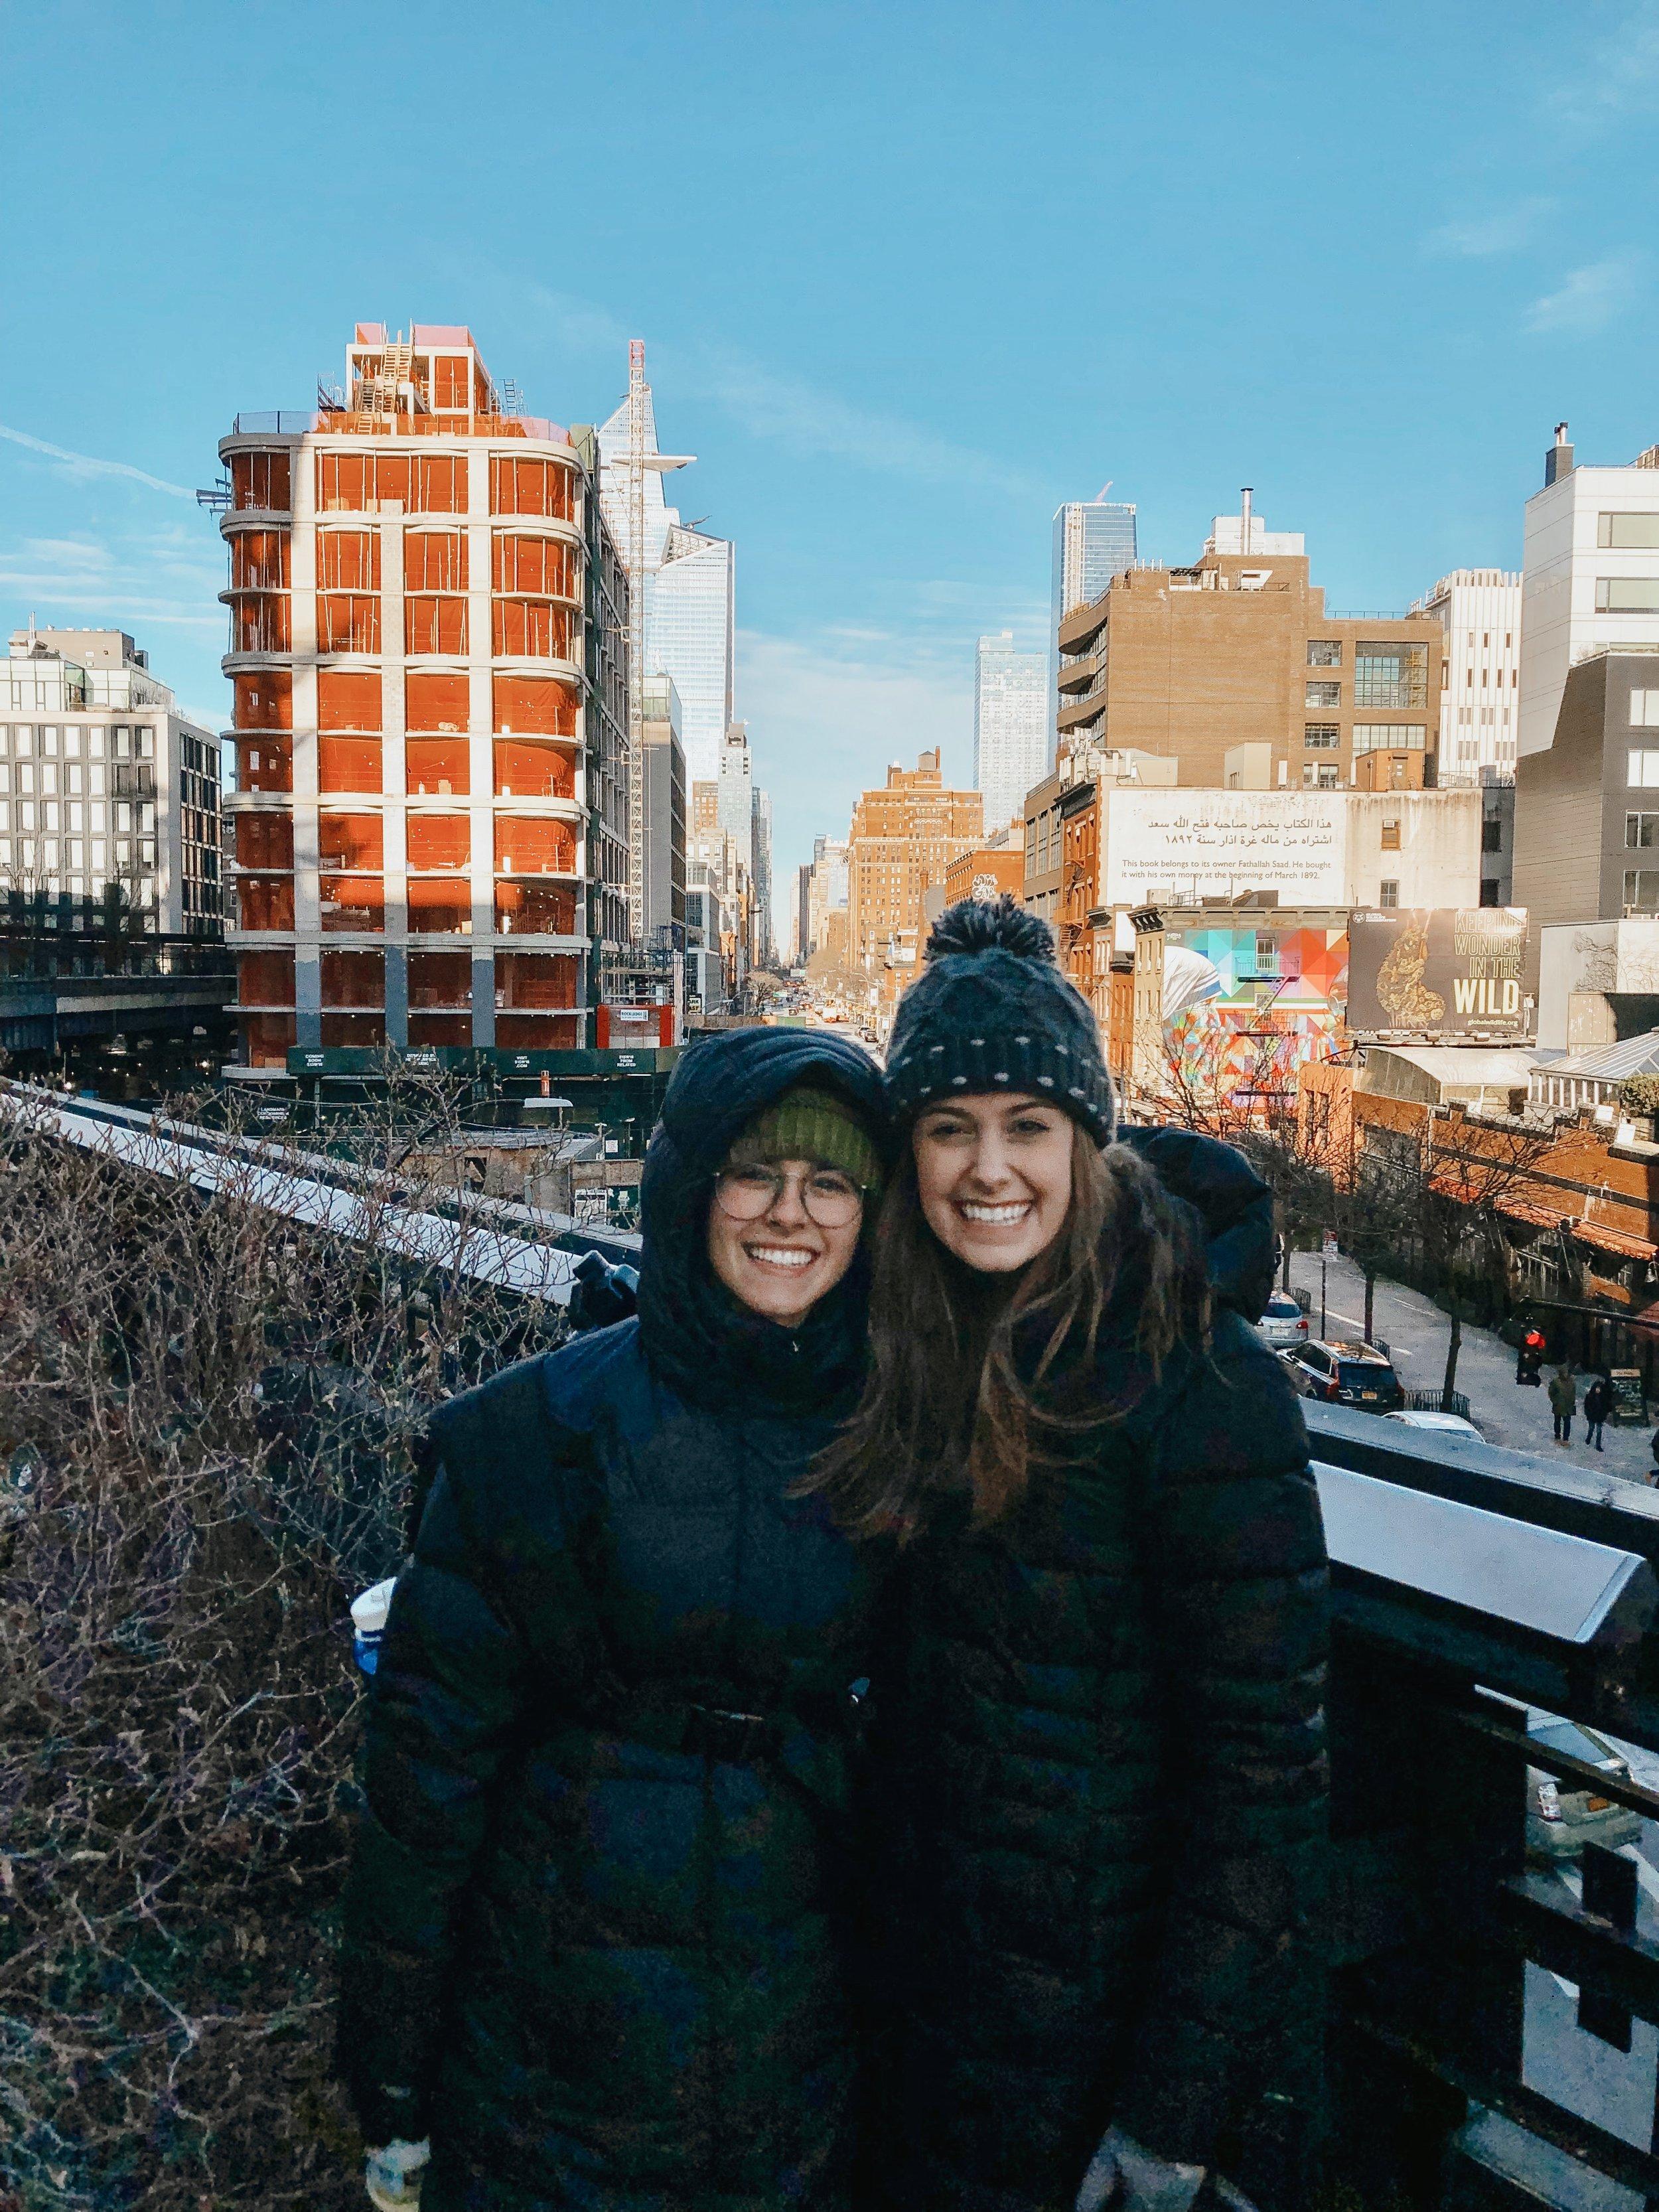 Photo taken by Tourist of Samantha McHenry and Sara Kreski on NYC High Line, 2019.